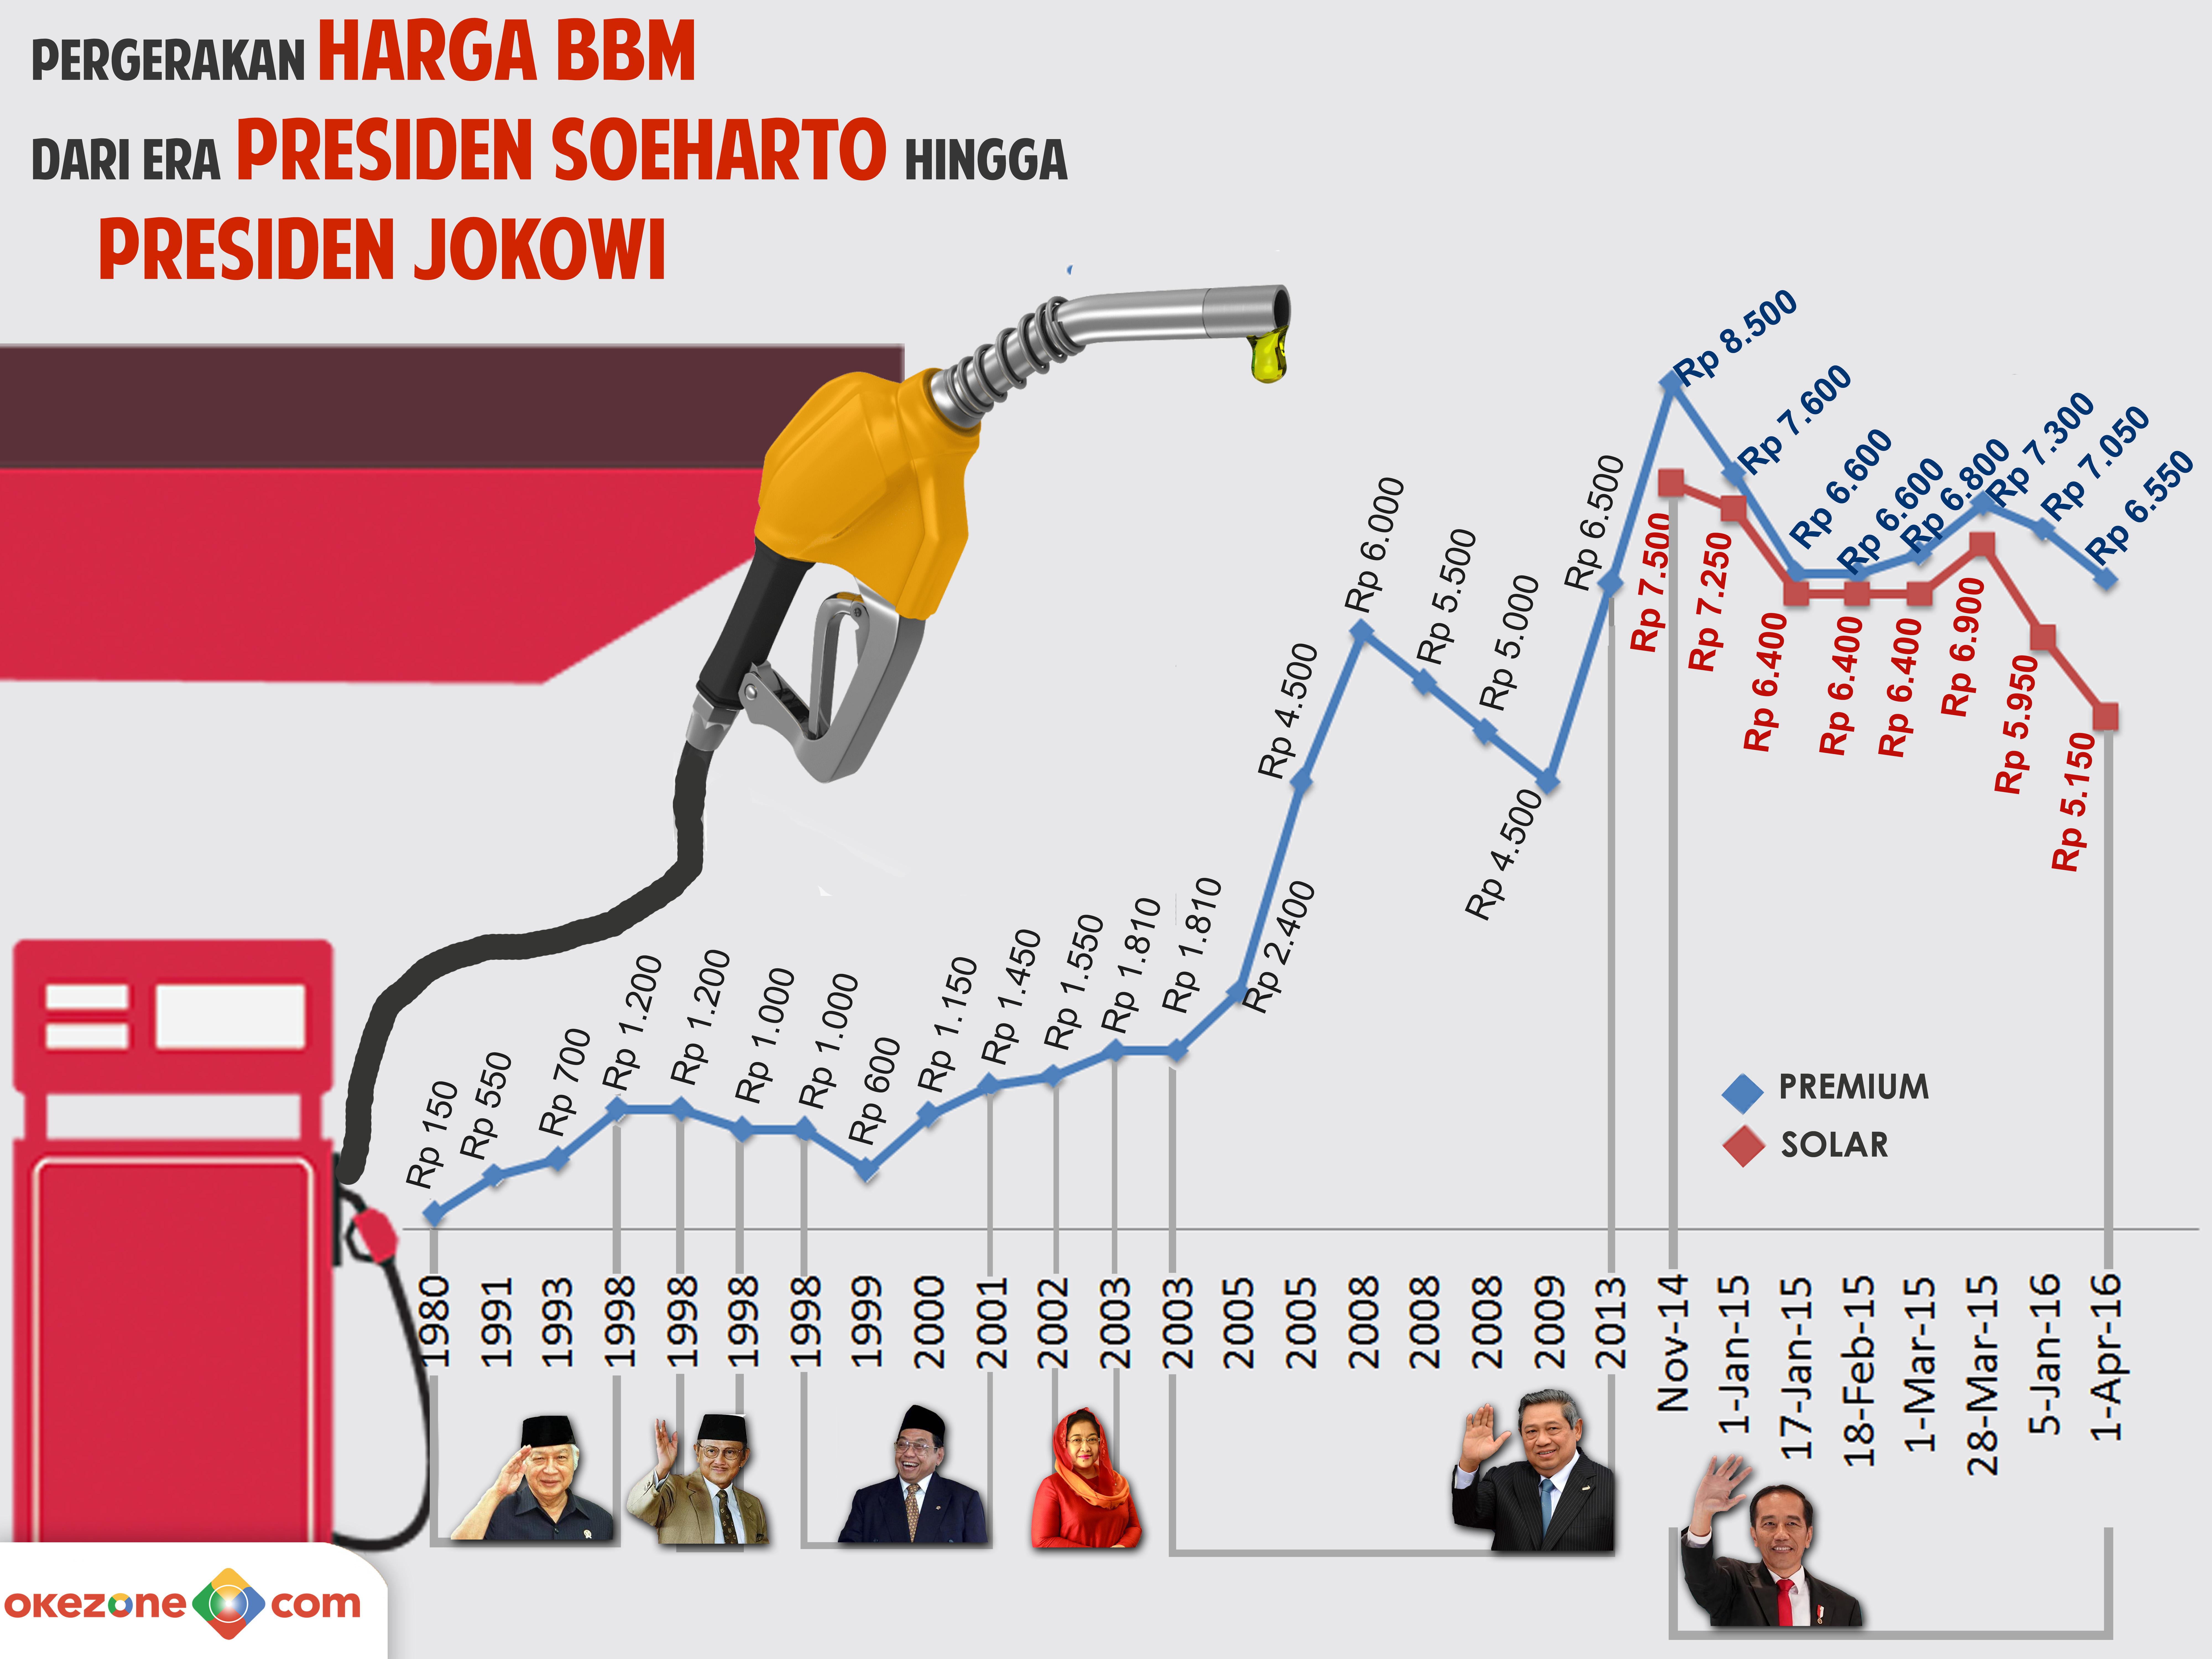 5 Bencana di Indonesia & Pergerakan Harga BBM -